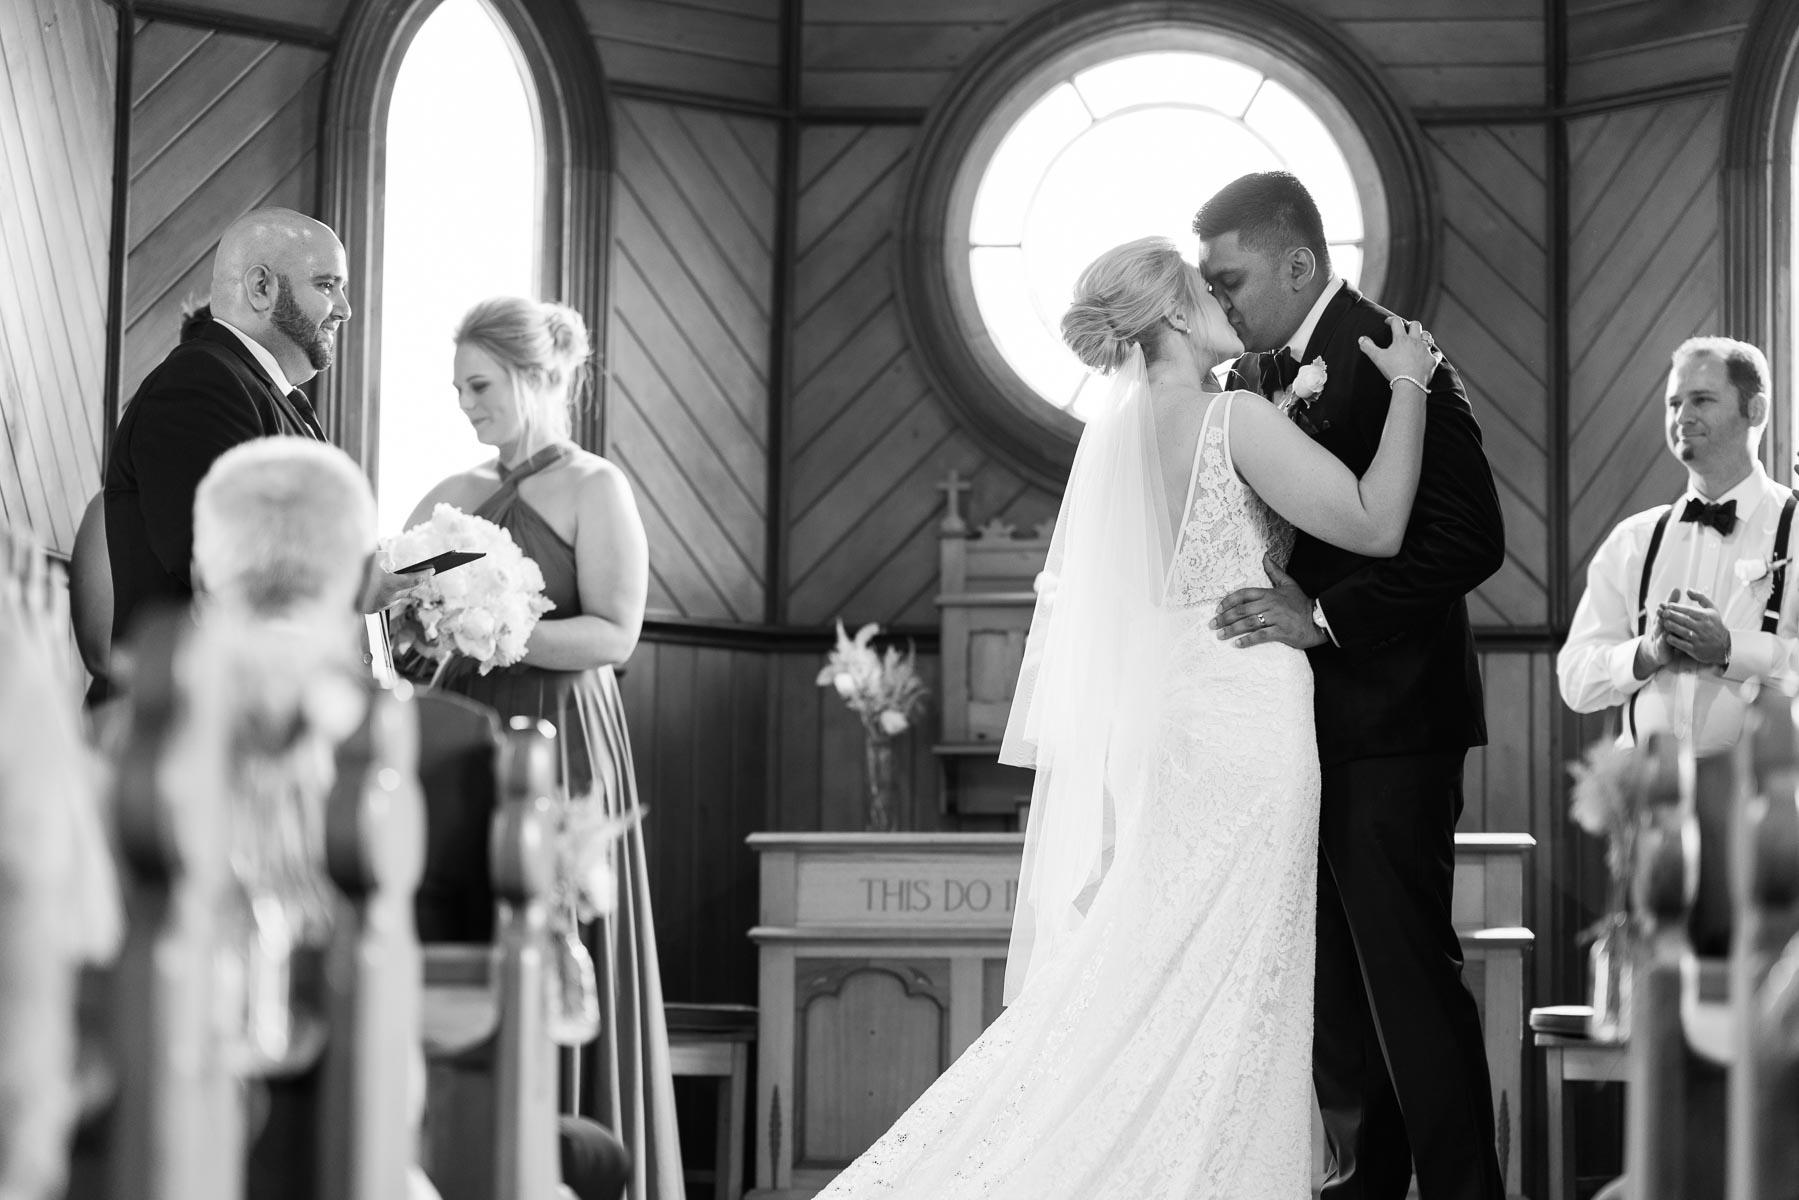 trenavin-chapel-phillip-island-wedding-heart+soul-weddings-sally-sean-00273.jpg